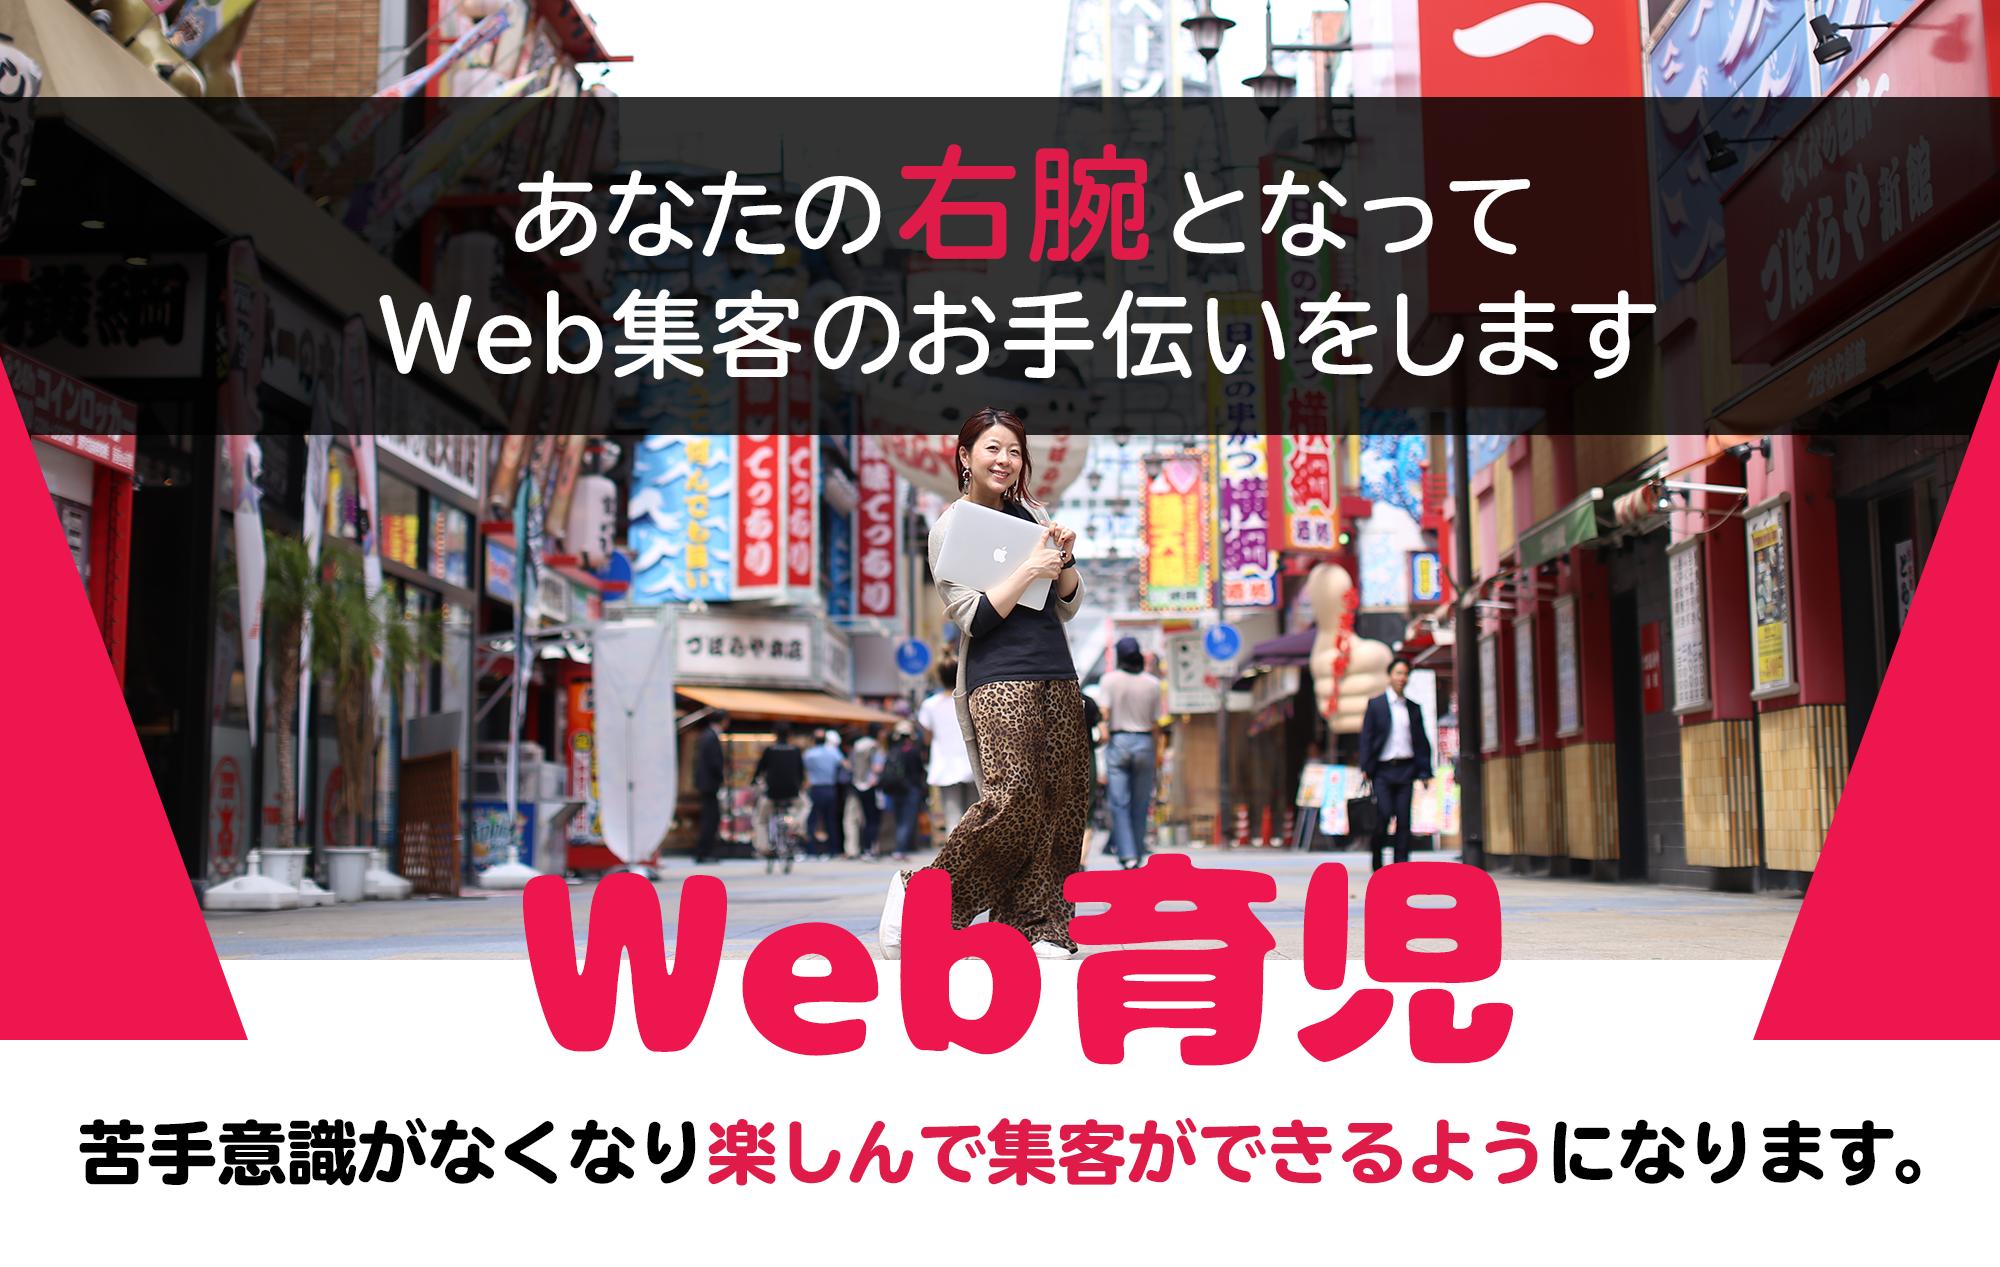 Web育児 Web集客サポート